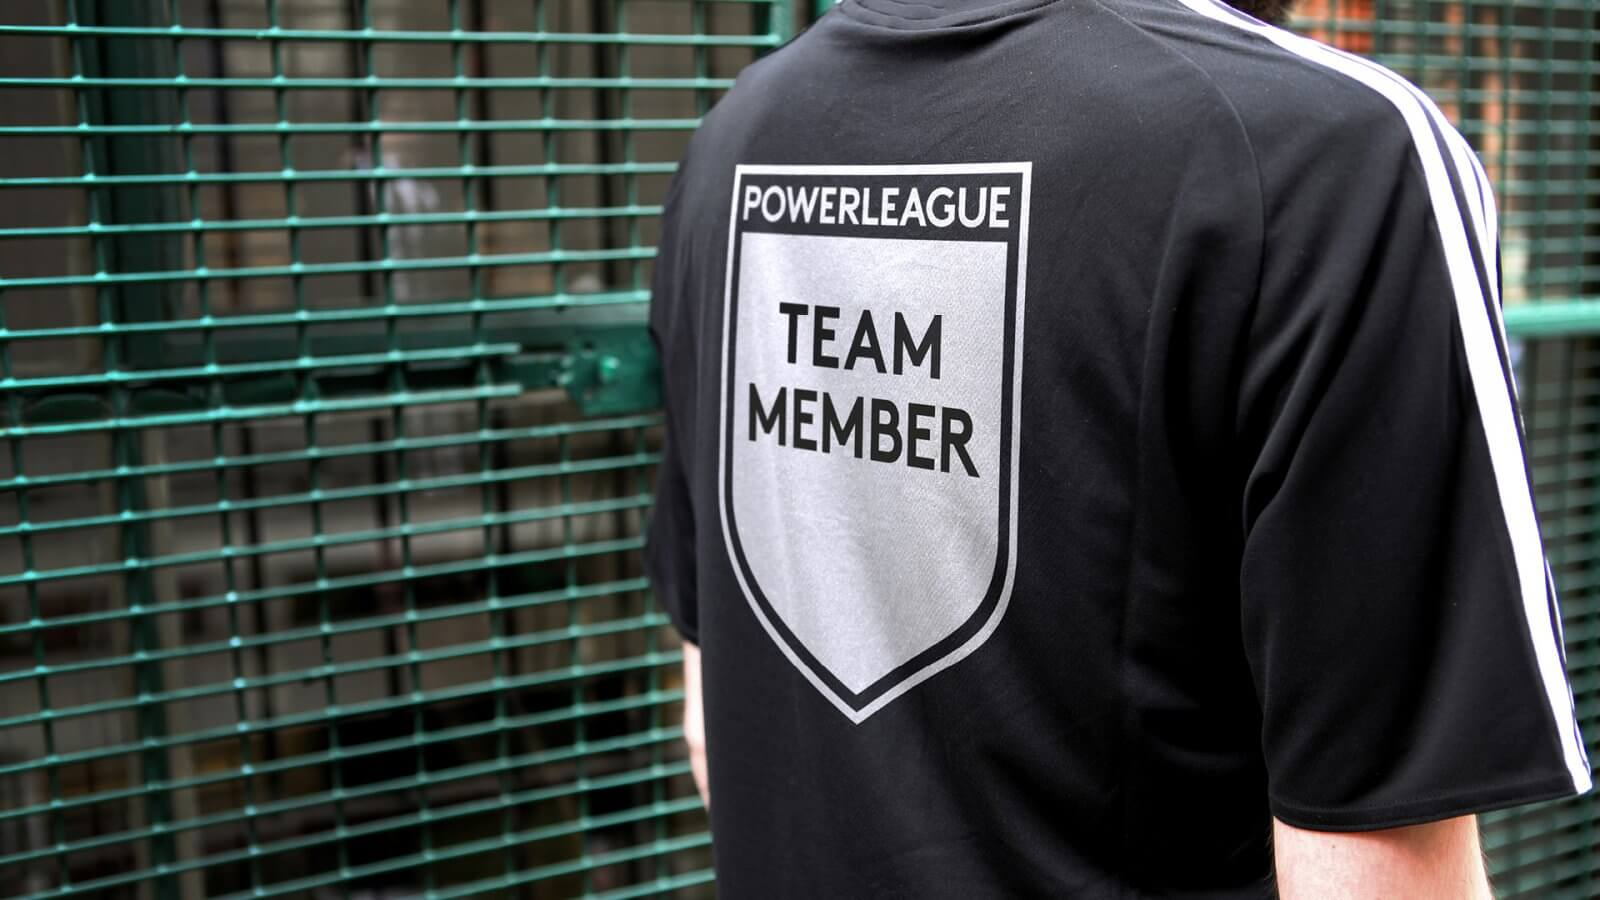 Powerleague23